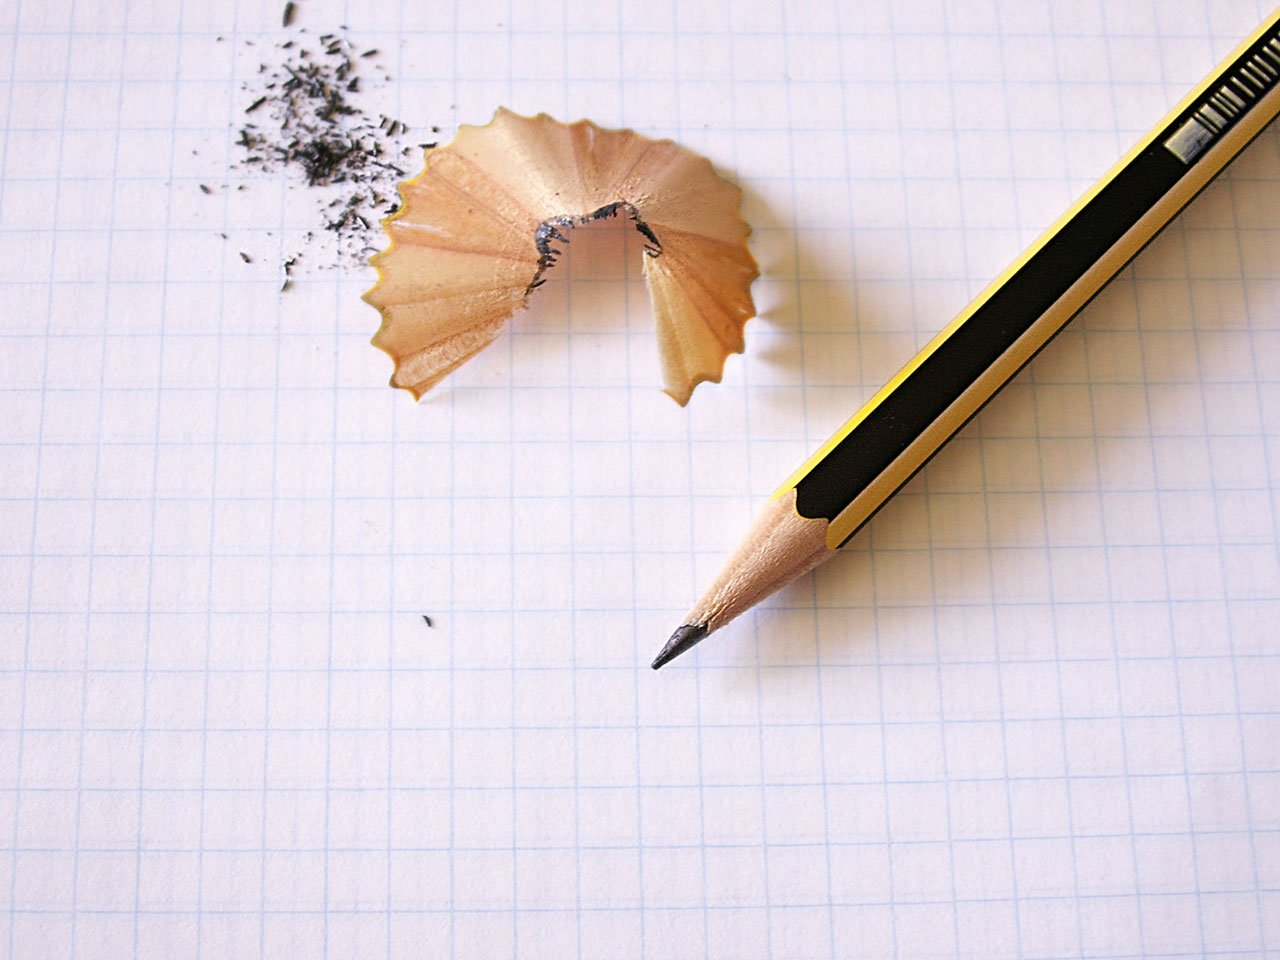 pencil-2269.jpg